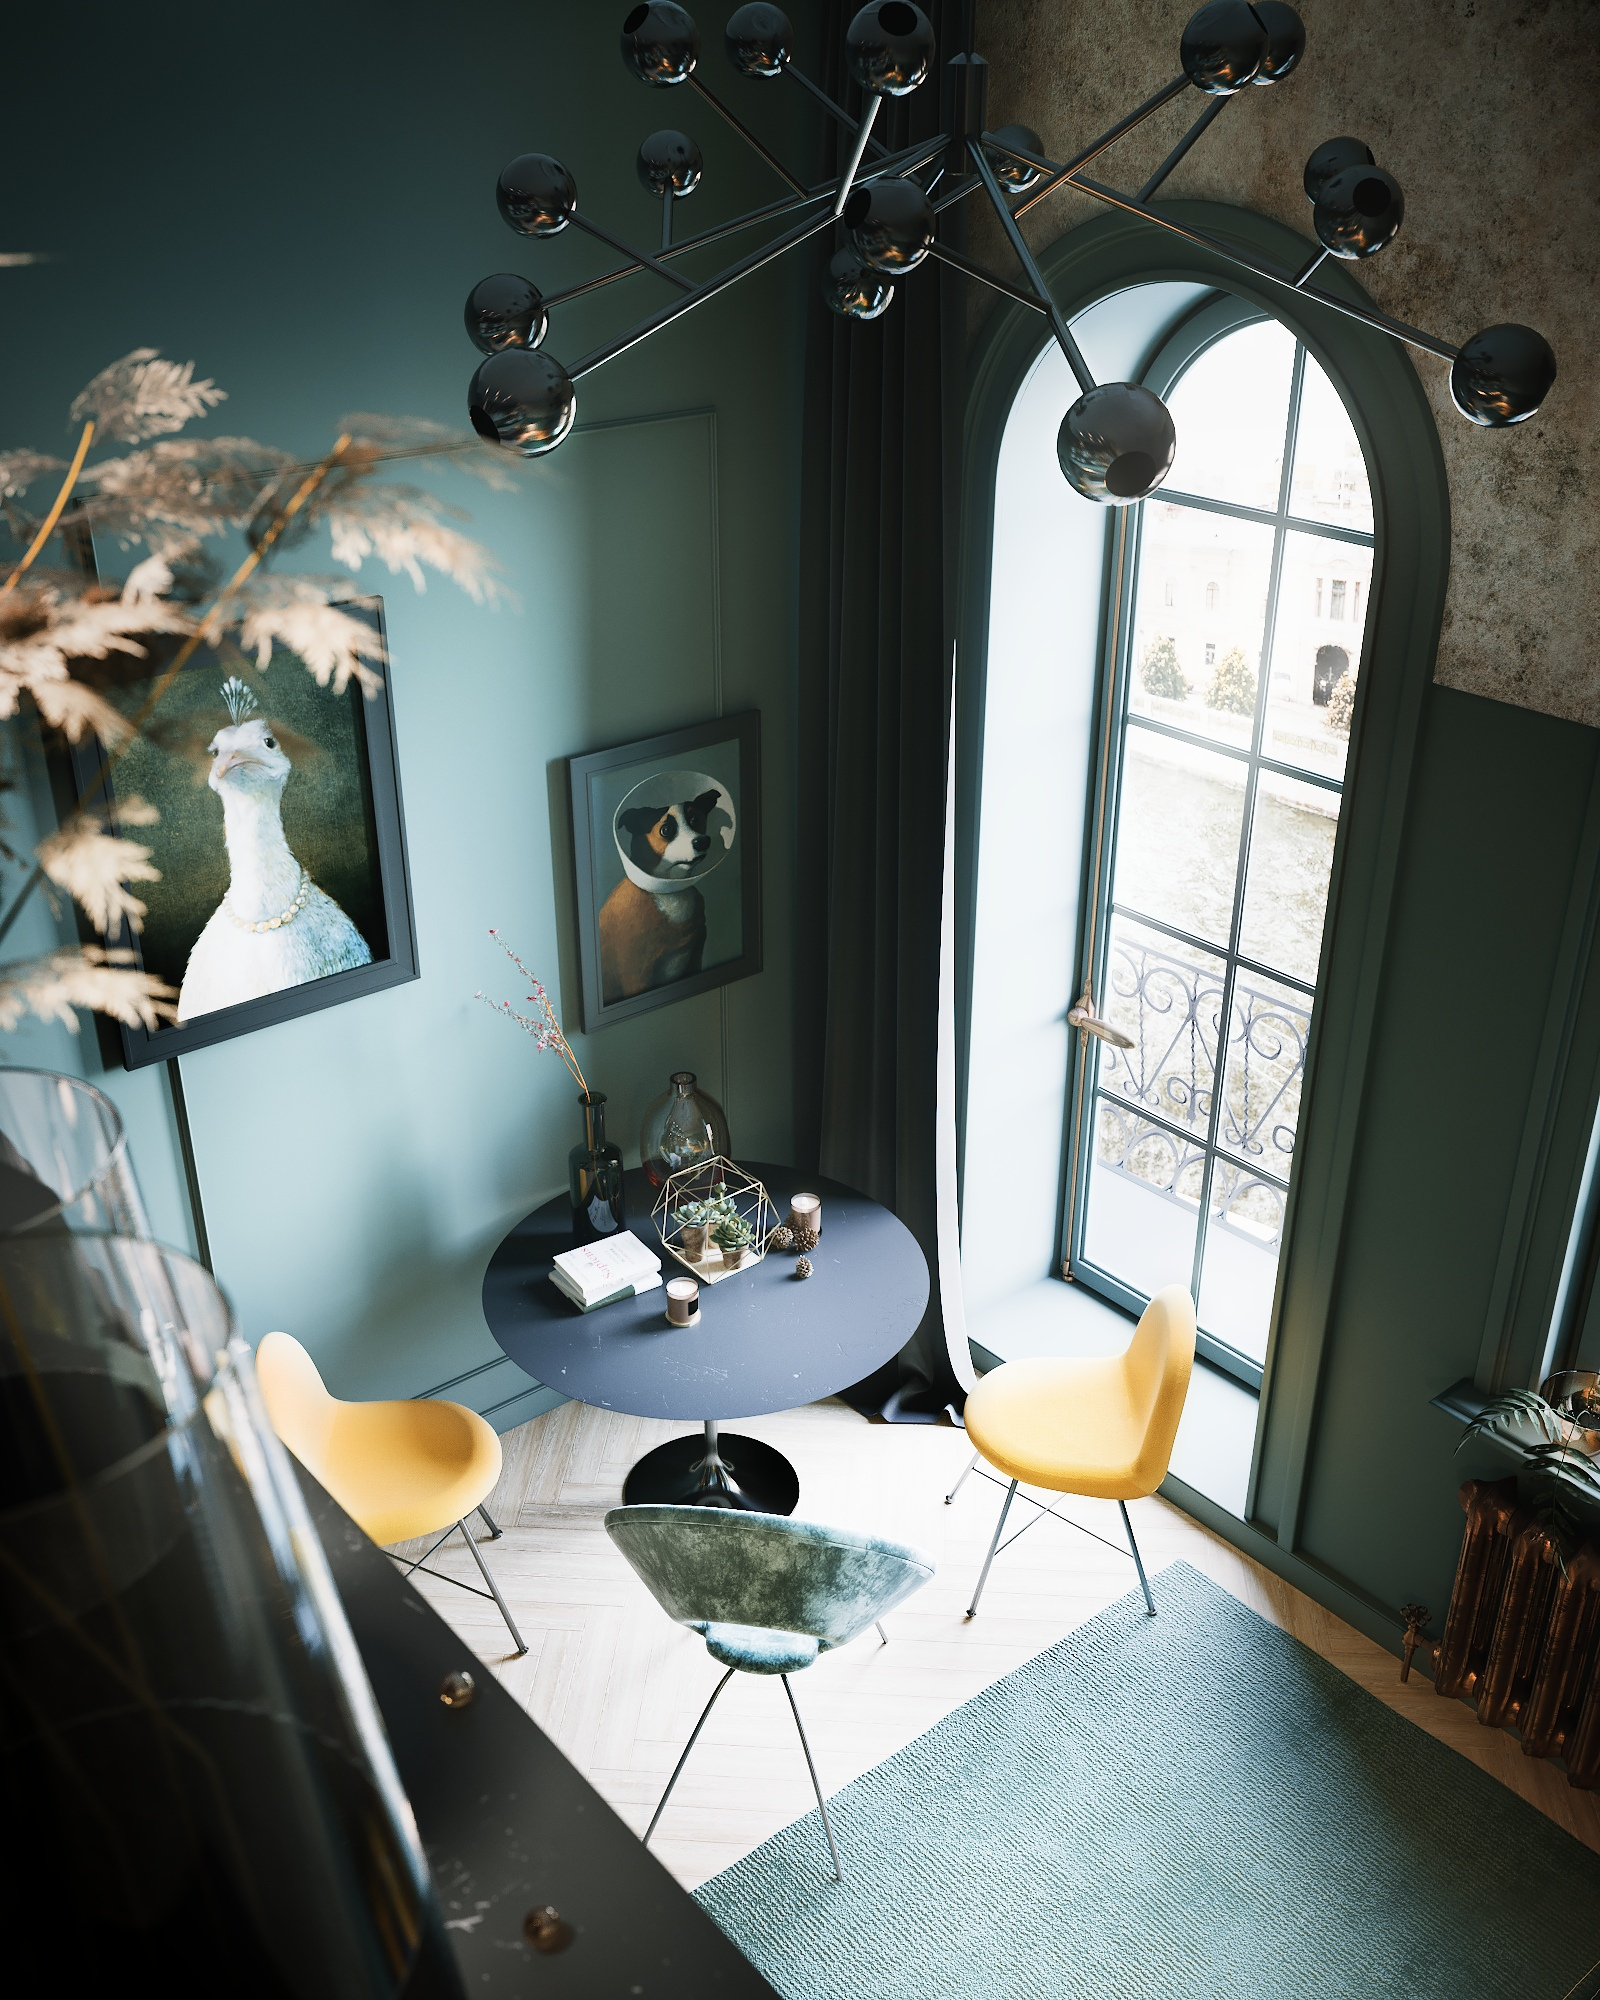 Проект двухуровневой квартиры-студии 21 м2, Санкт-Петербург.